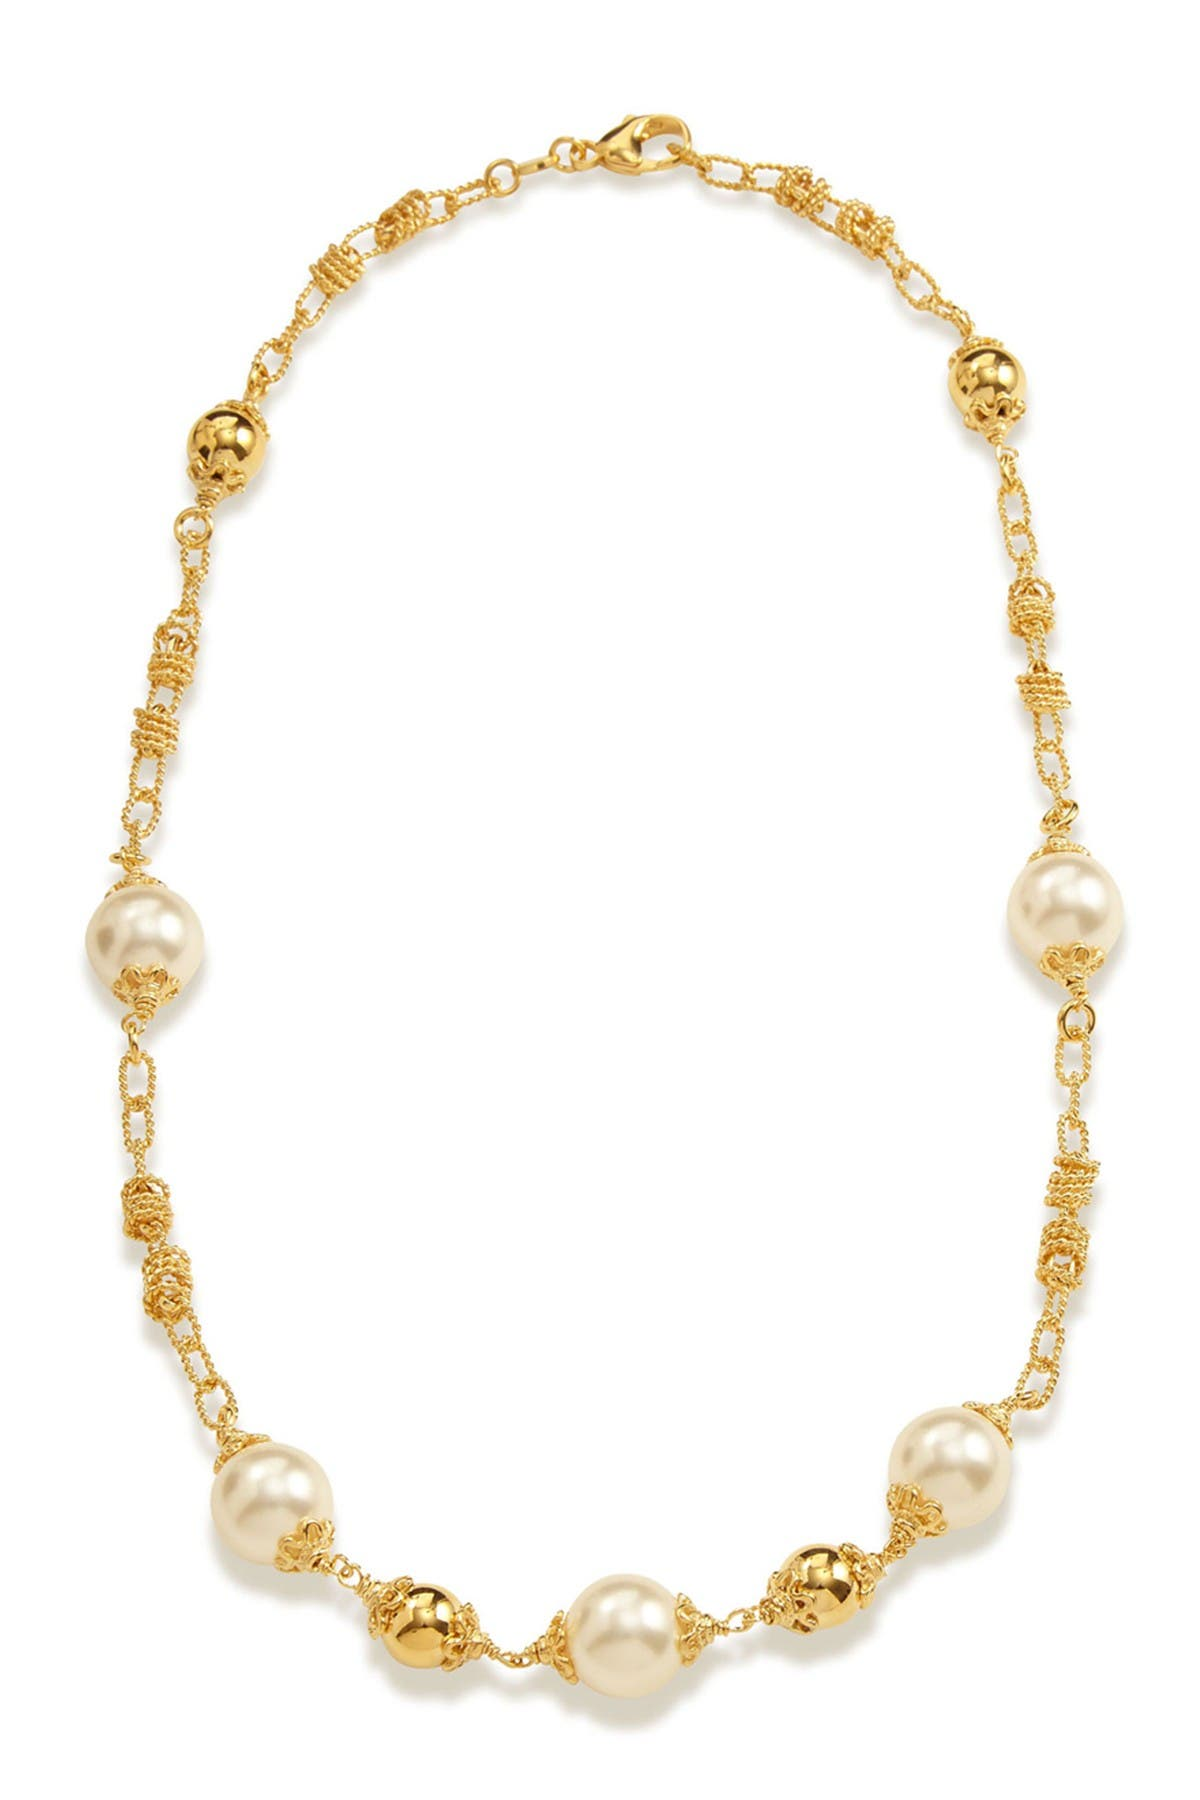 Image of Savvy Cie Swarovski Pearl Bauble Necklace